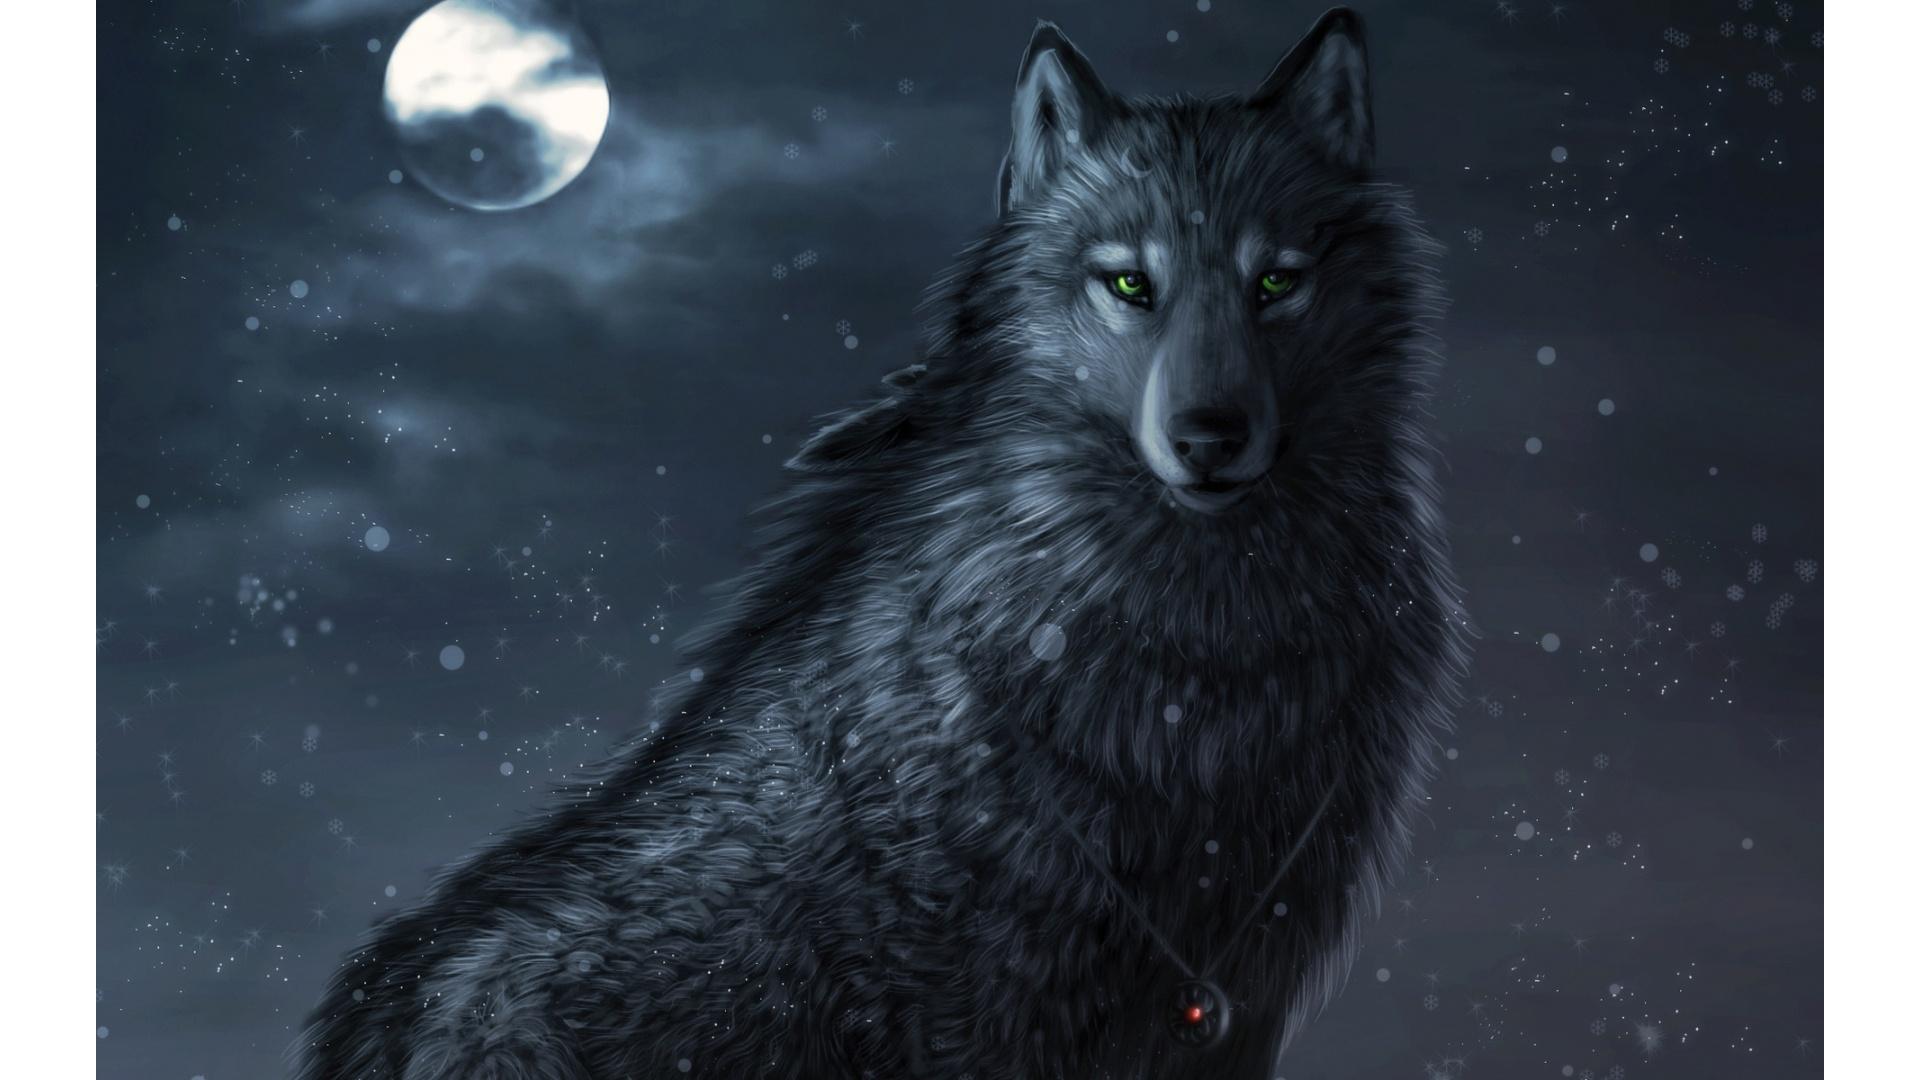 Animated Wolf 1920x1080 470392